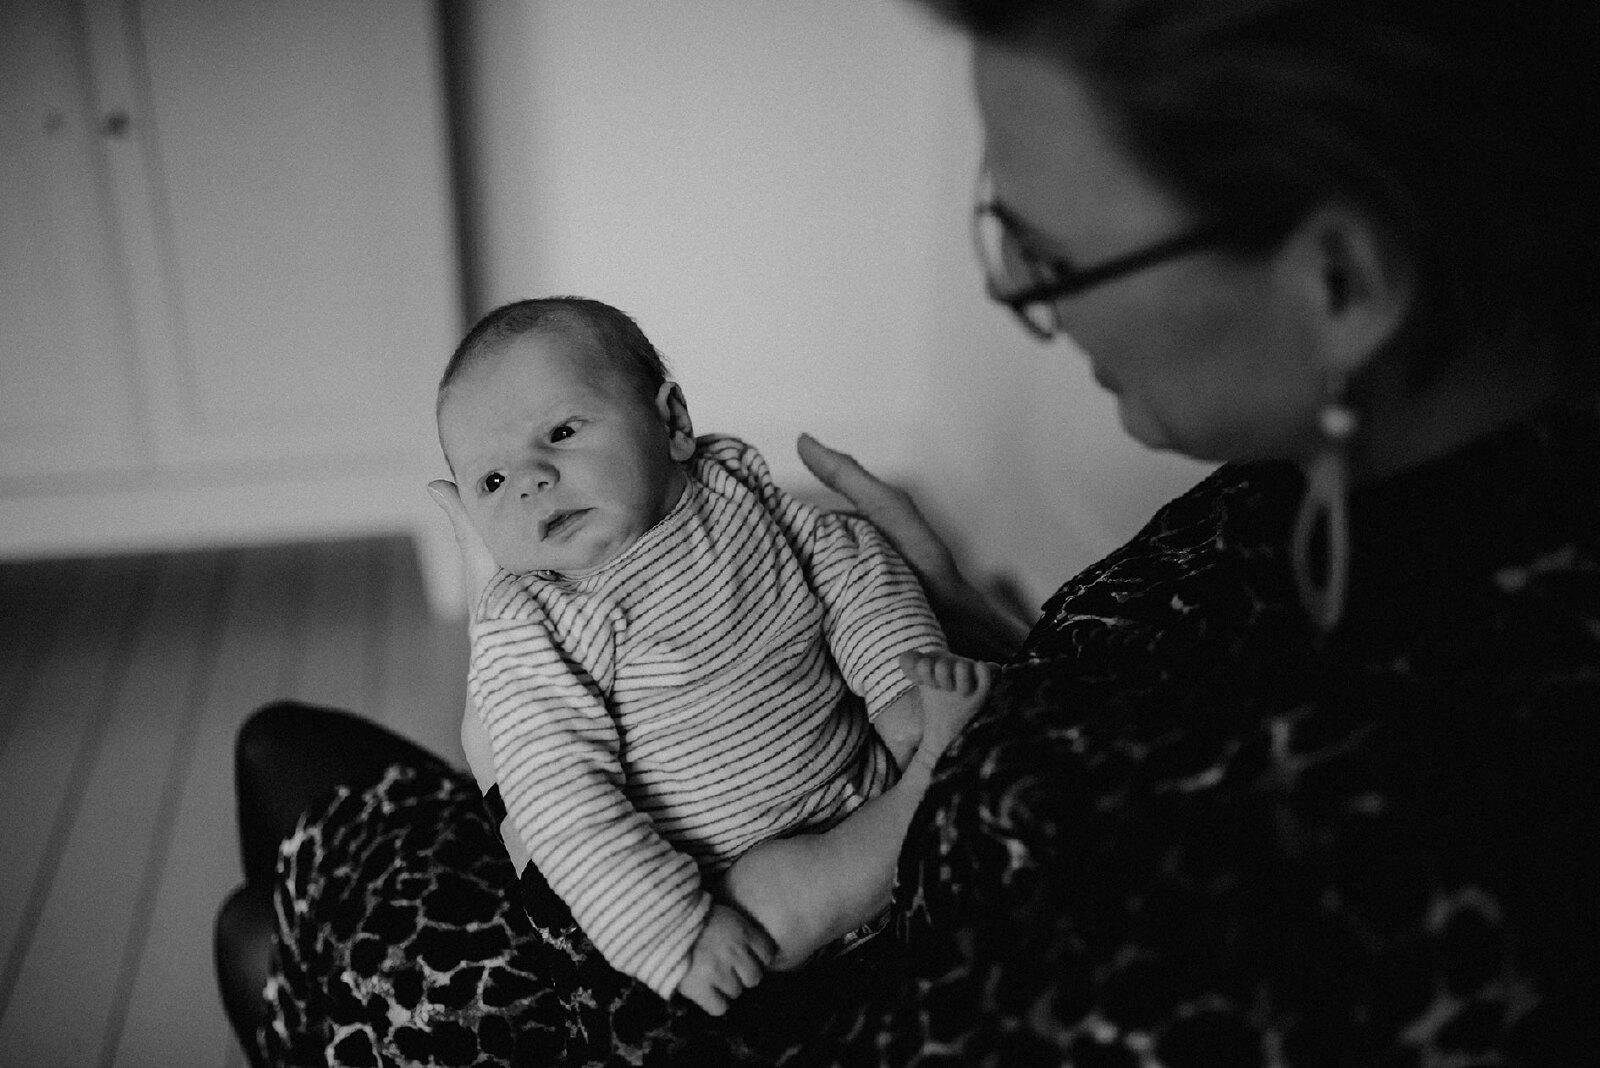 newbornfotografie - Enschede - Twente - Losser